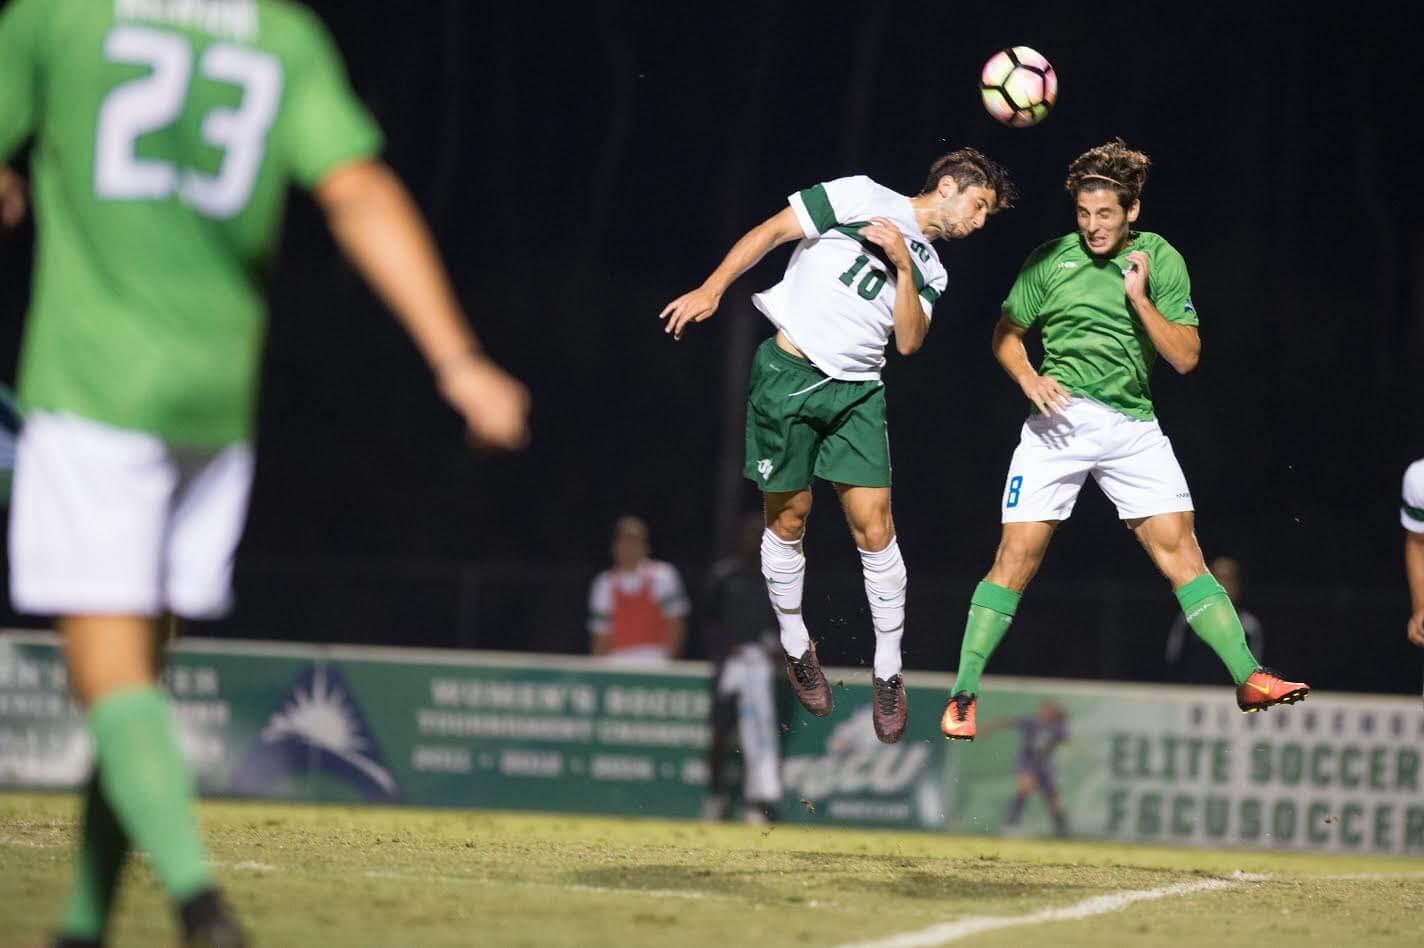 FGCU men's soccer defeats Jacksonville 3-2 to claim ASUN Soccer Championship